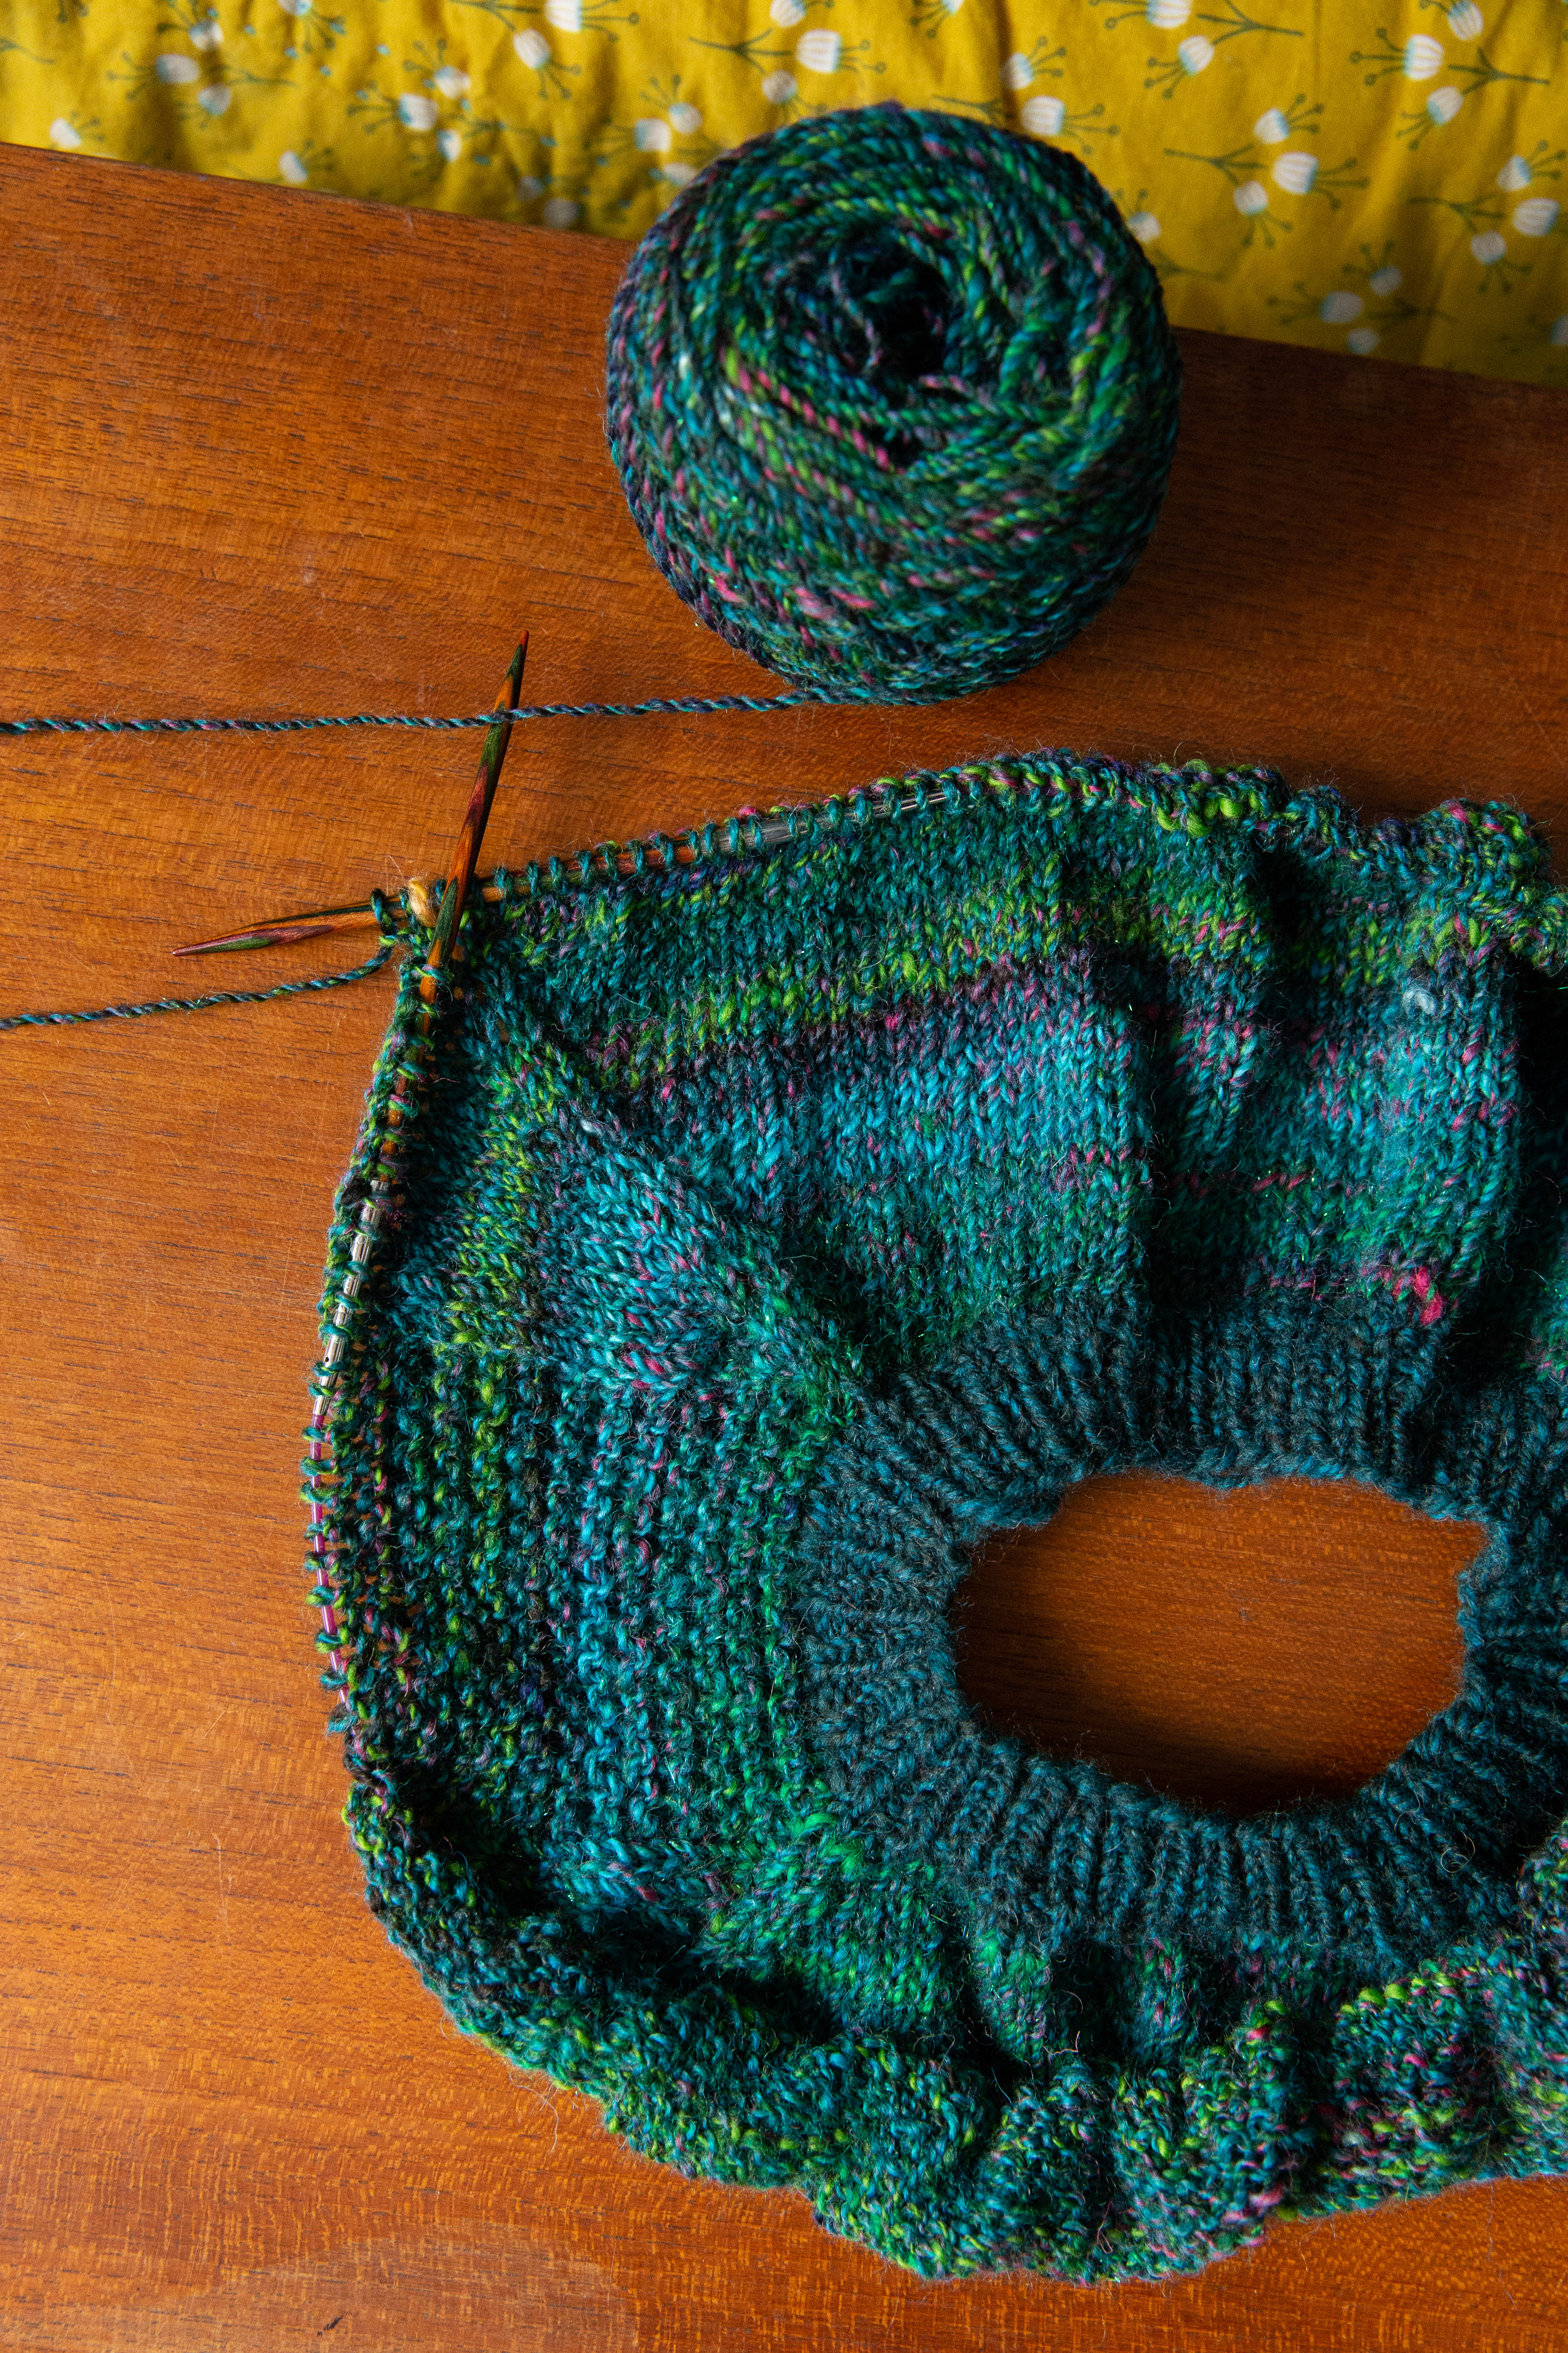 green and teal handspun raglan sweater yoke on the needles with a yarn ball